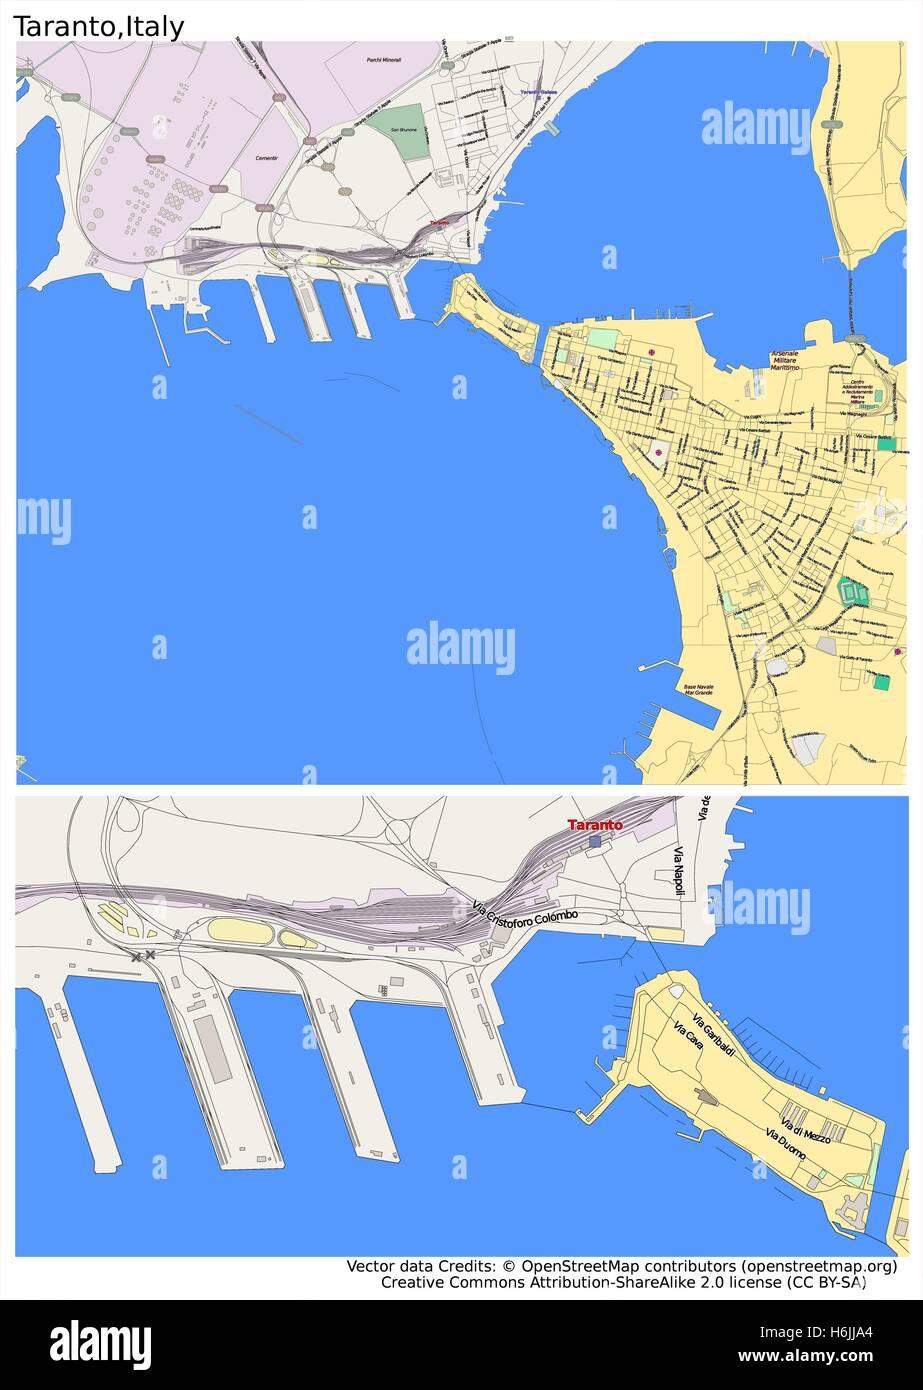 Taranto italy city map stock vector art illustration vector image taranto italy city map altavistaventures Image collections